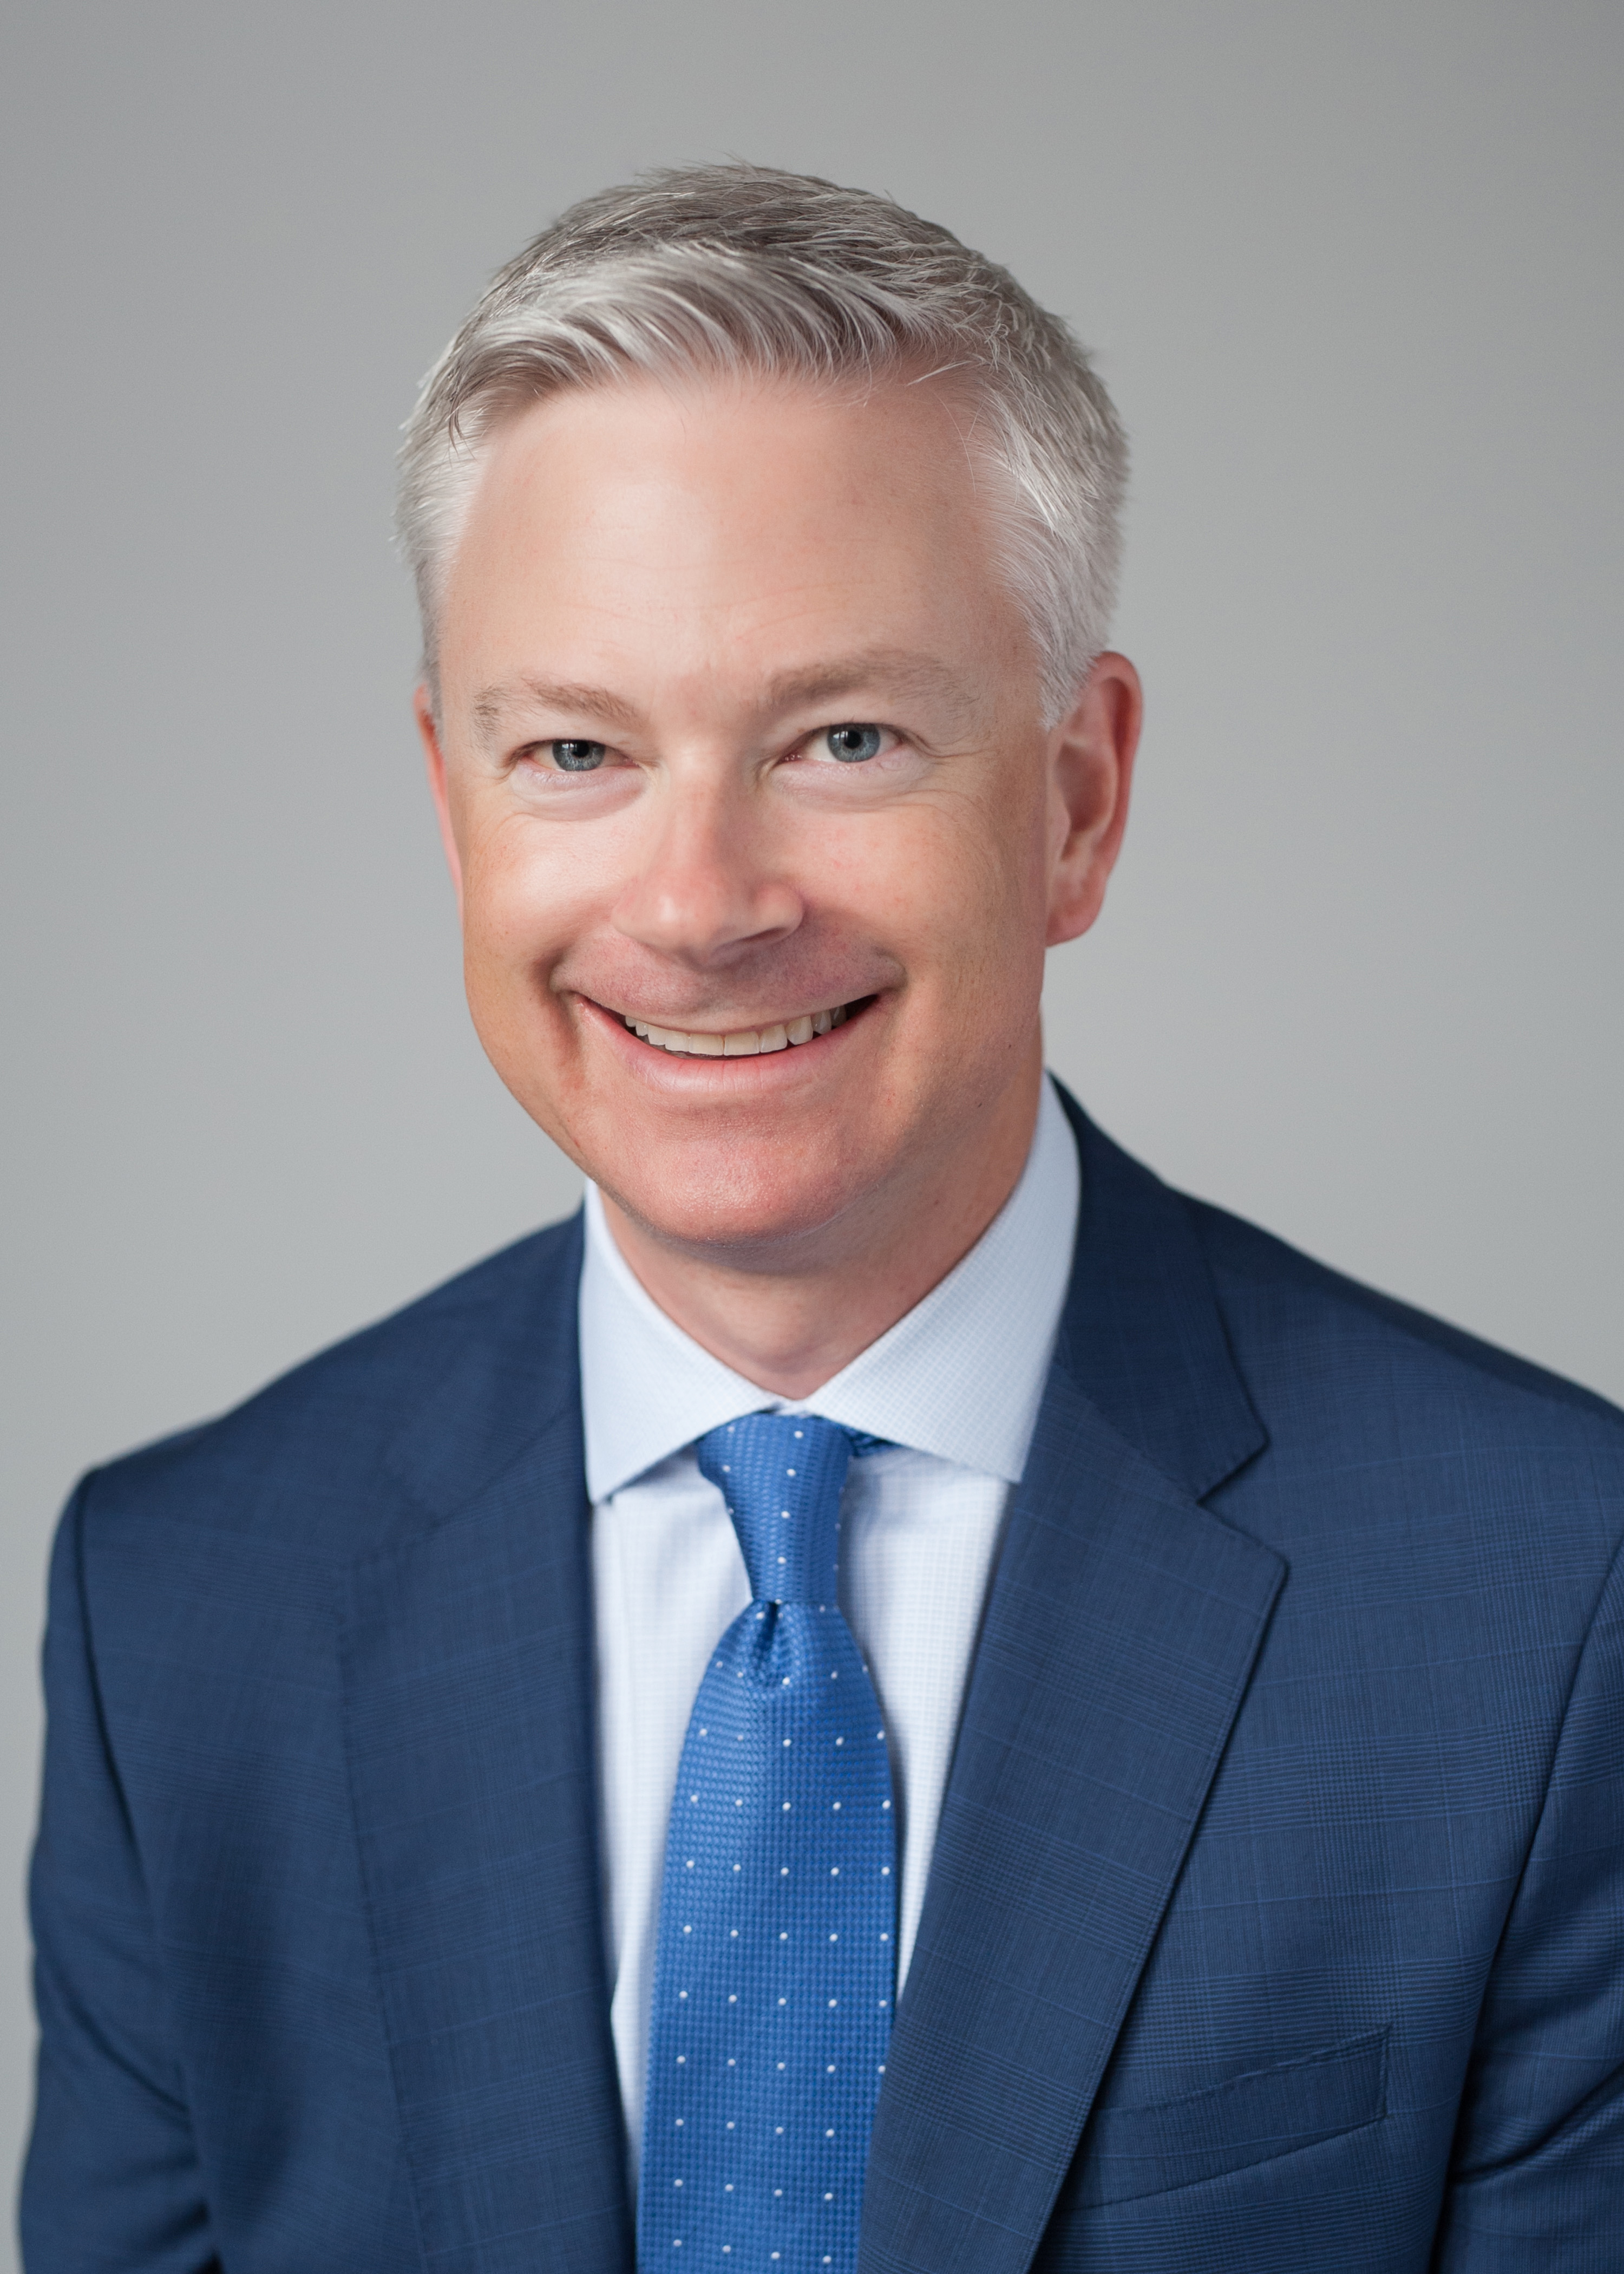 Gov. Evers Appoints John W. Miller to the UW Board of Regents